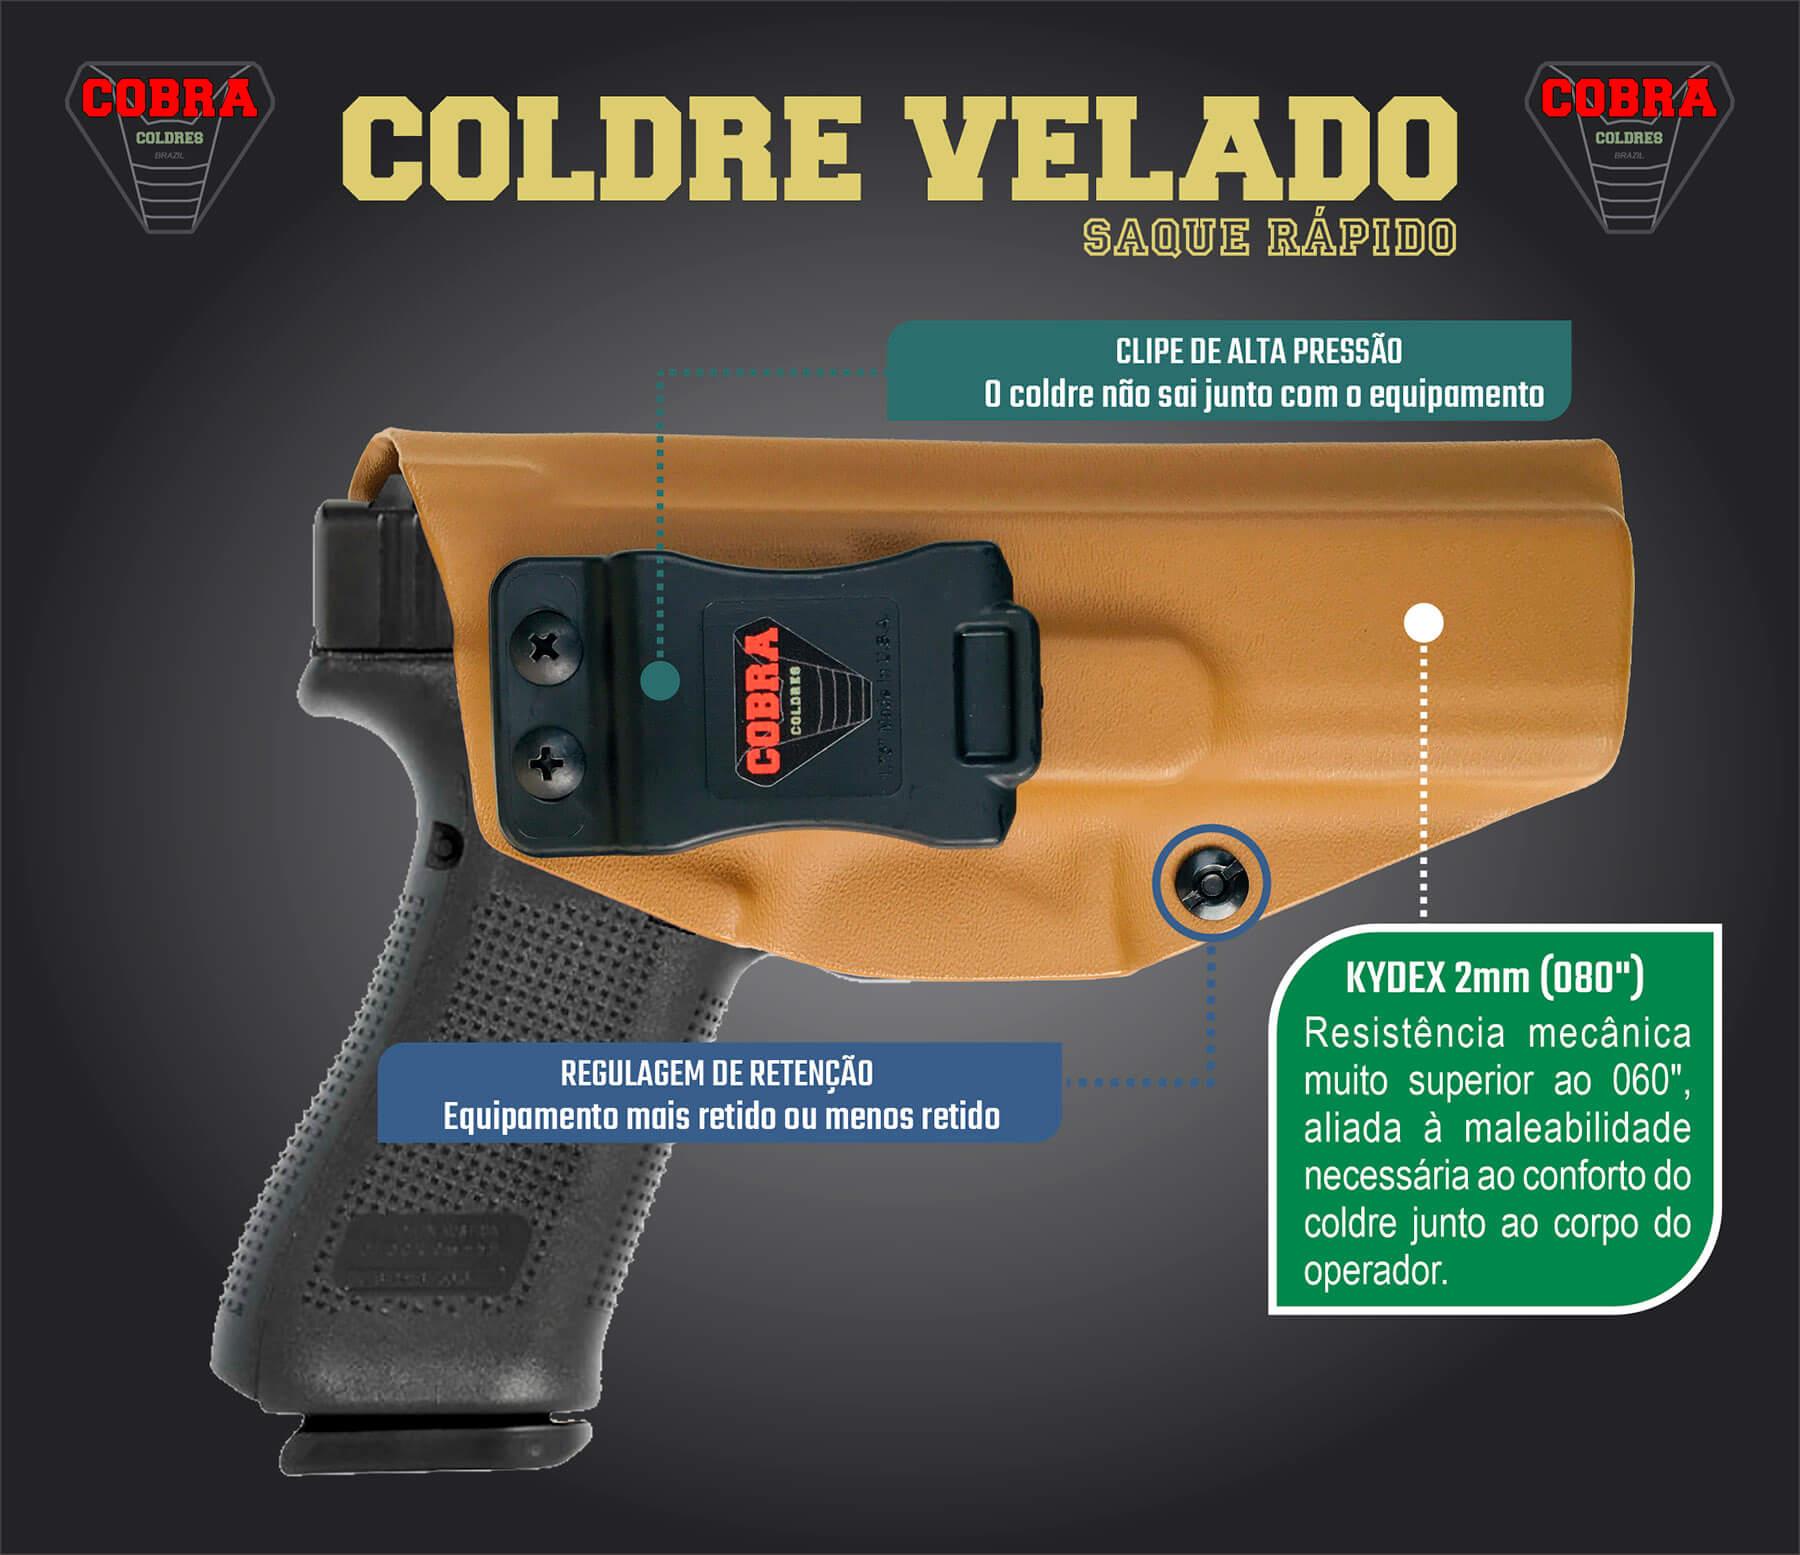 Coldre [PT92] [PT92AF] [PT99] [PT59] [PT100] Kydex + 1 Porta-Carregador Universal - Saque Rápido Velado Kydex® 080